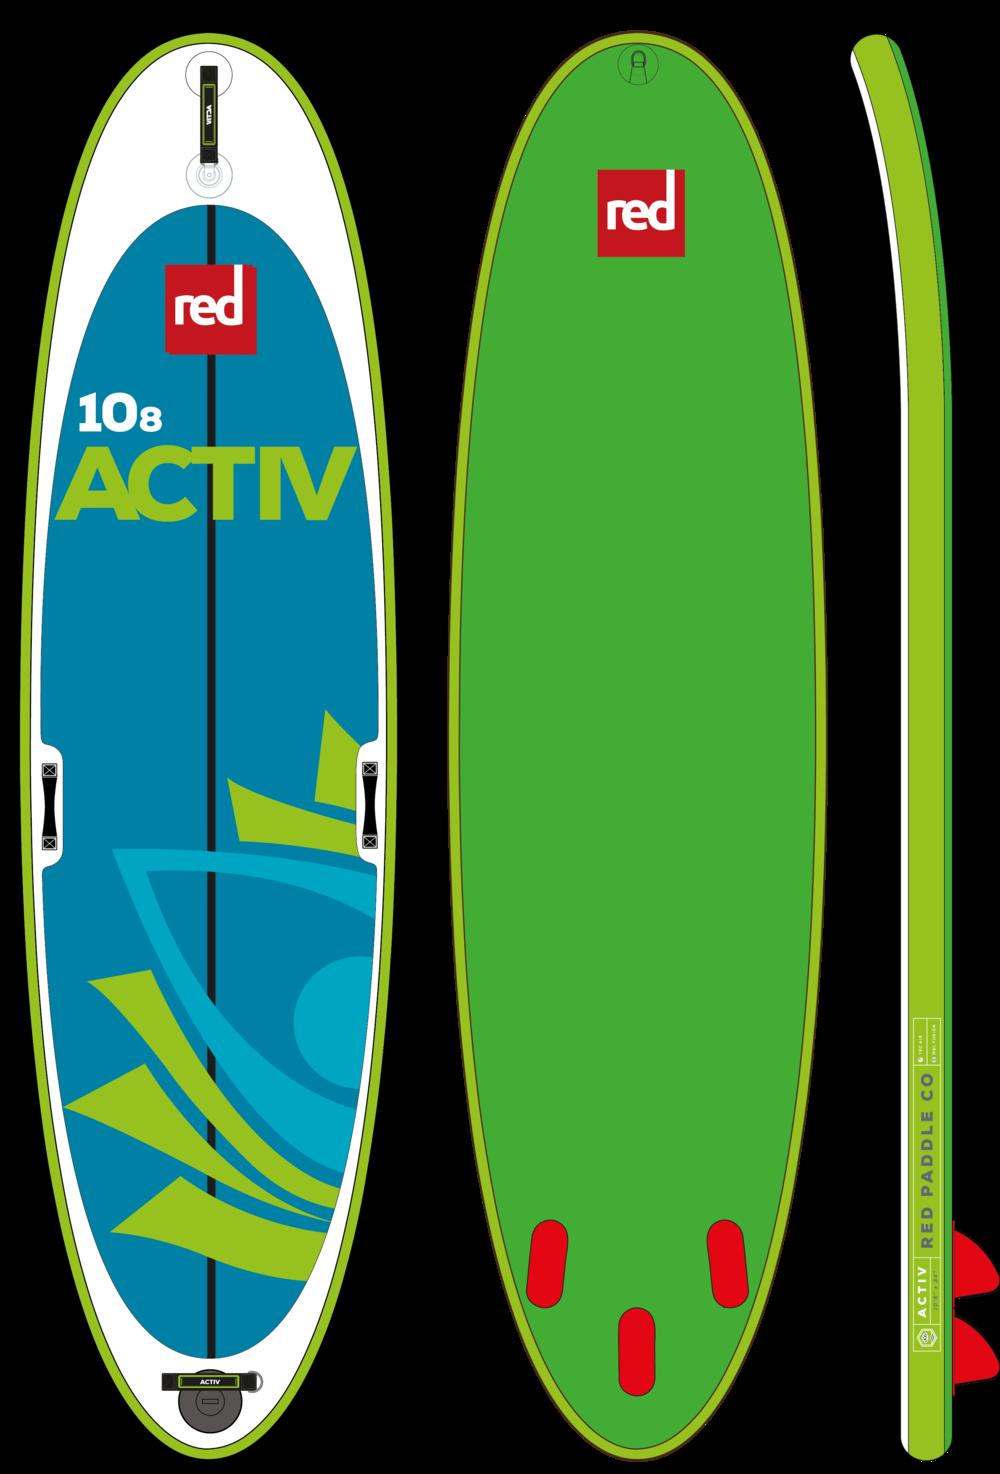 10'8 Active - $1549 - 10'8 x 34